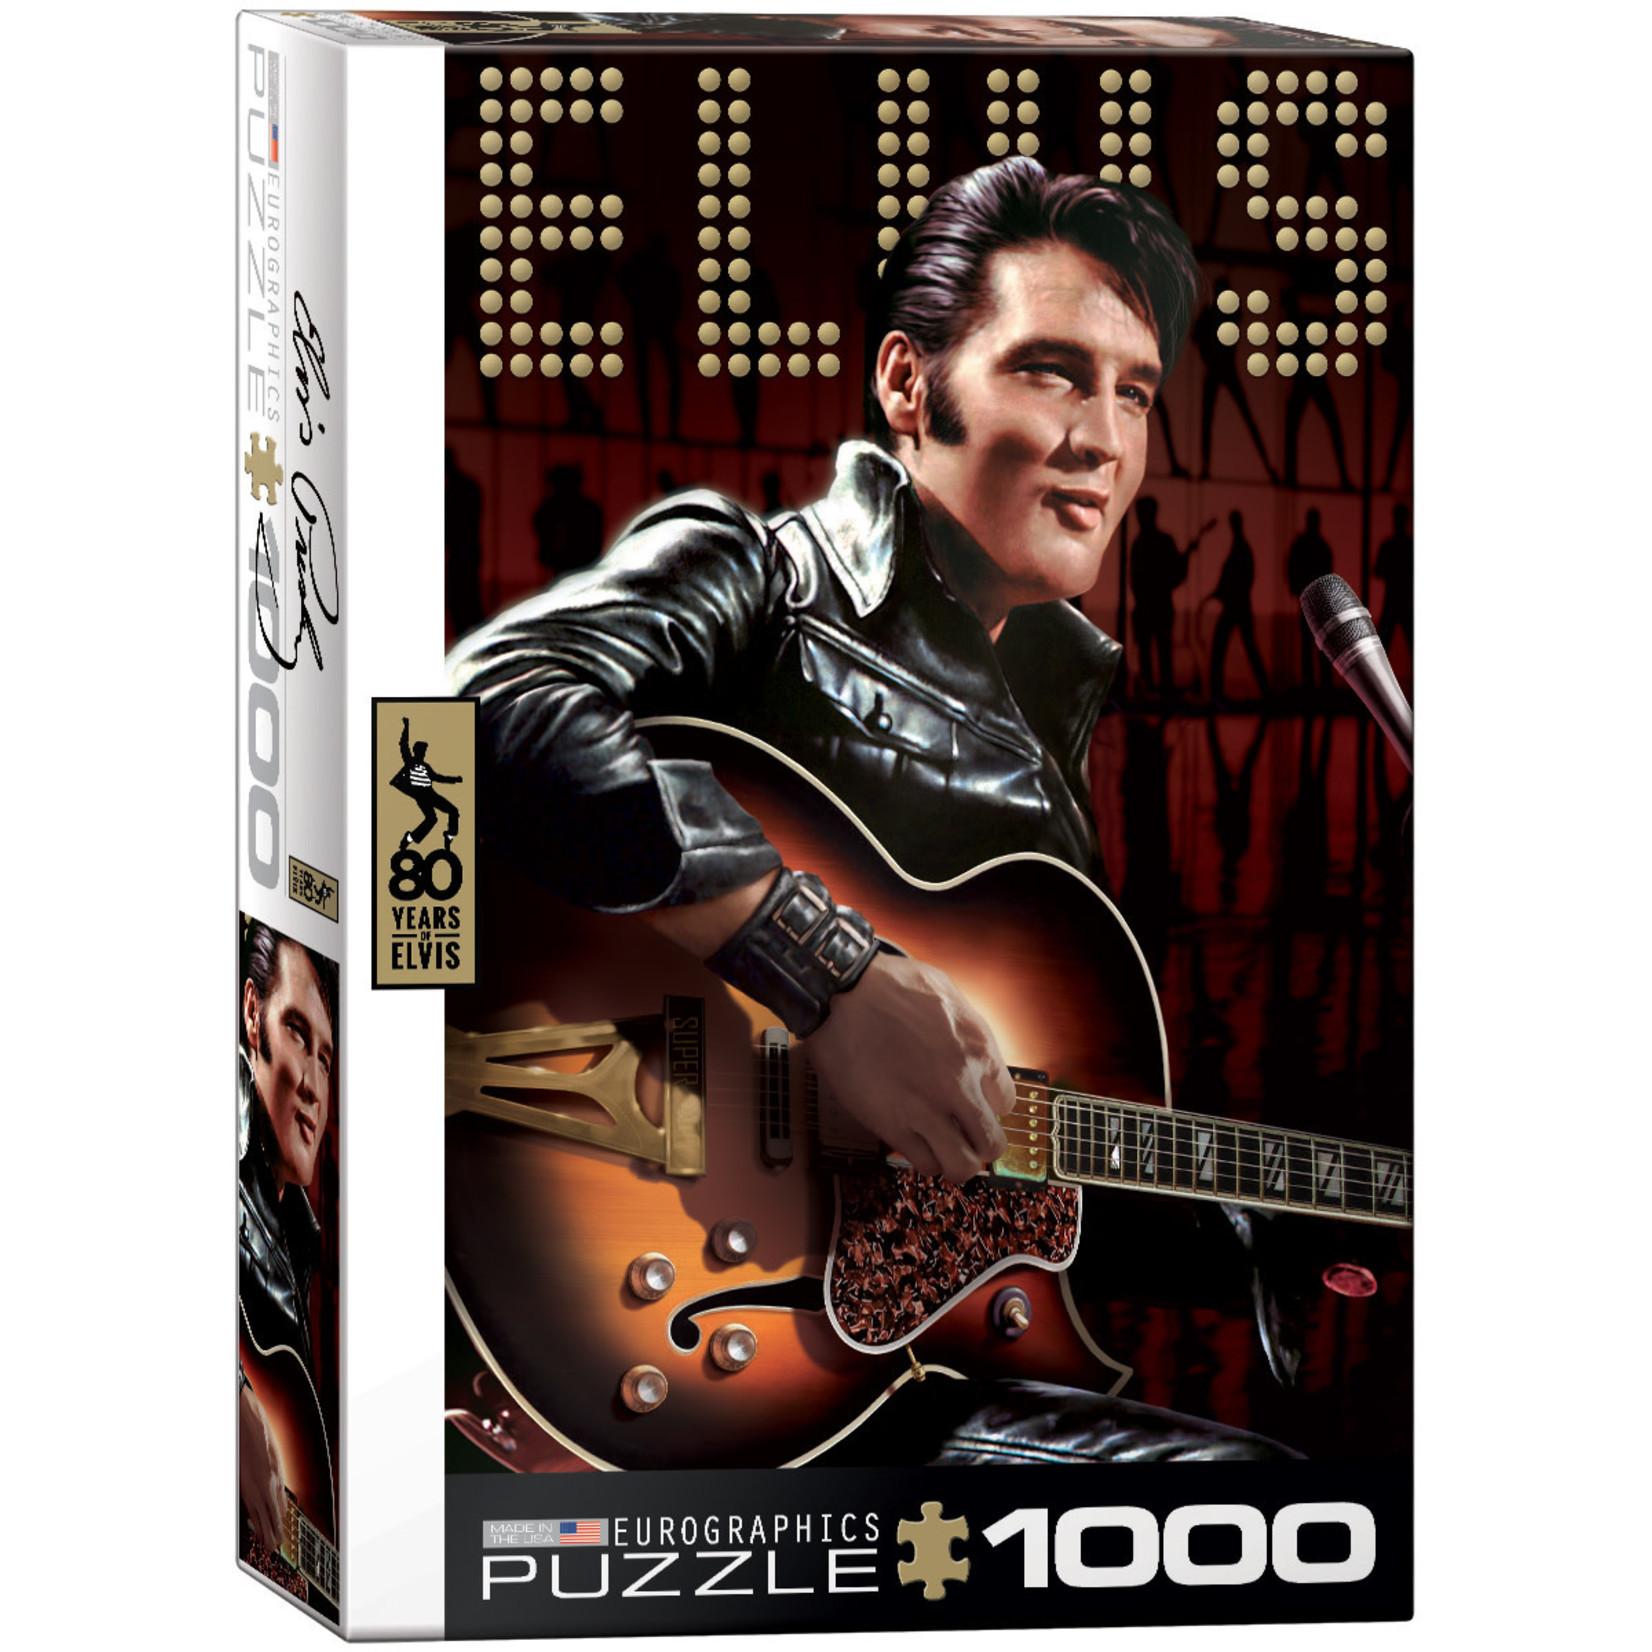 Eurographics Eurographics Puzzle: Elvis Presley Comeback Special - 1000pc